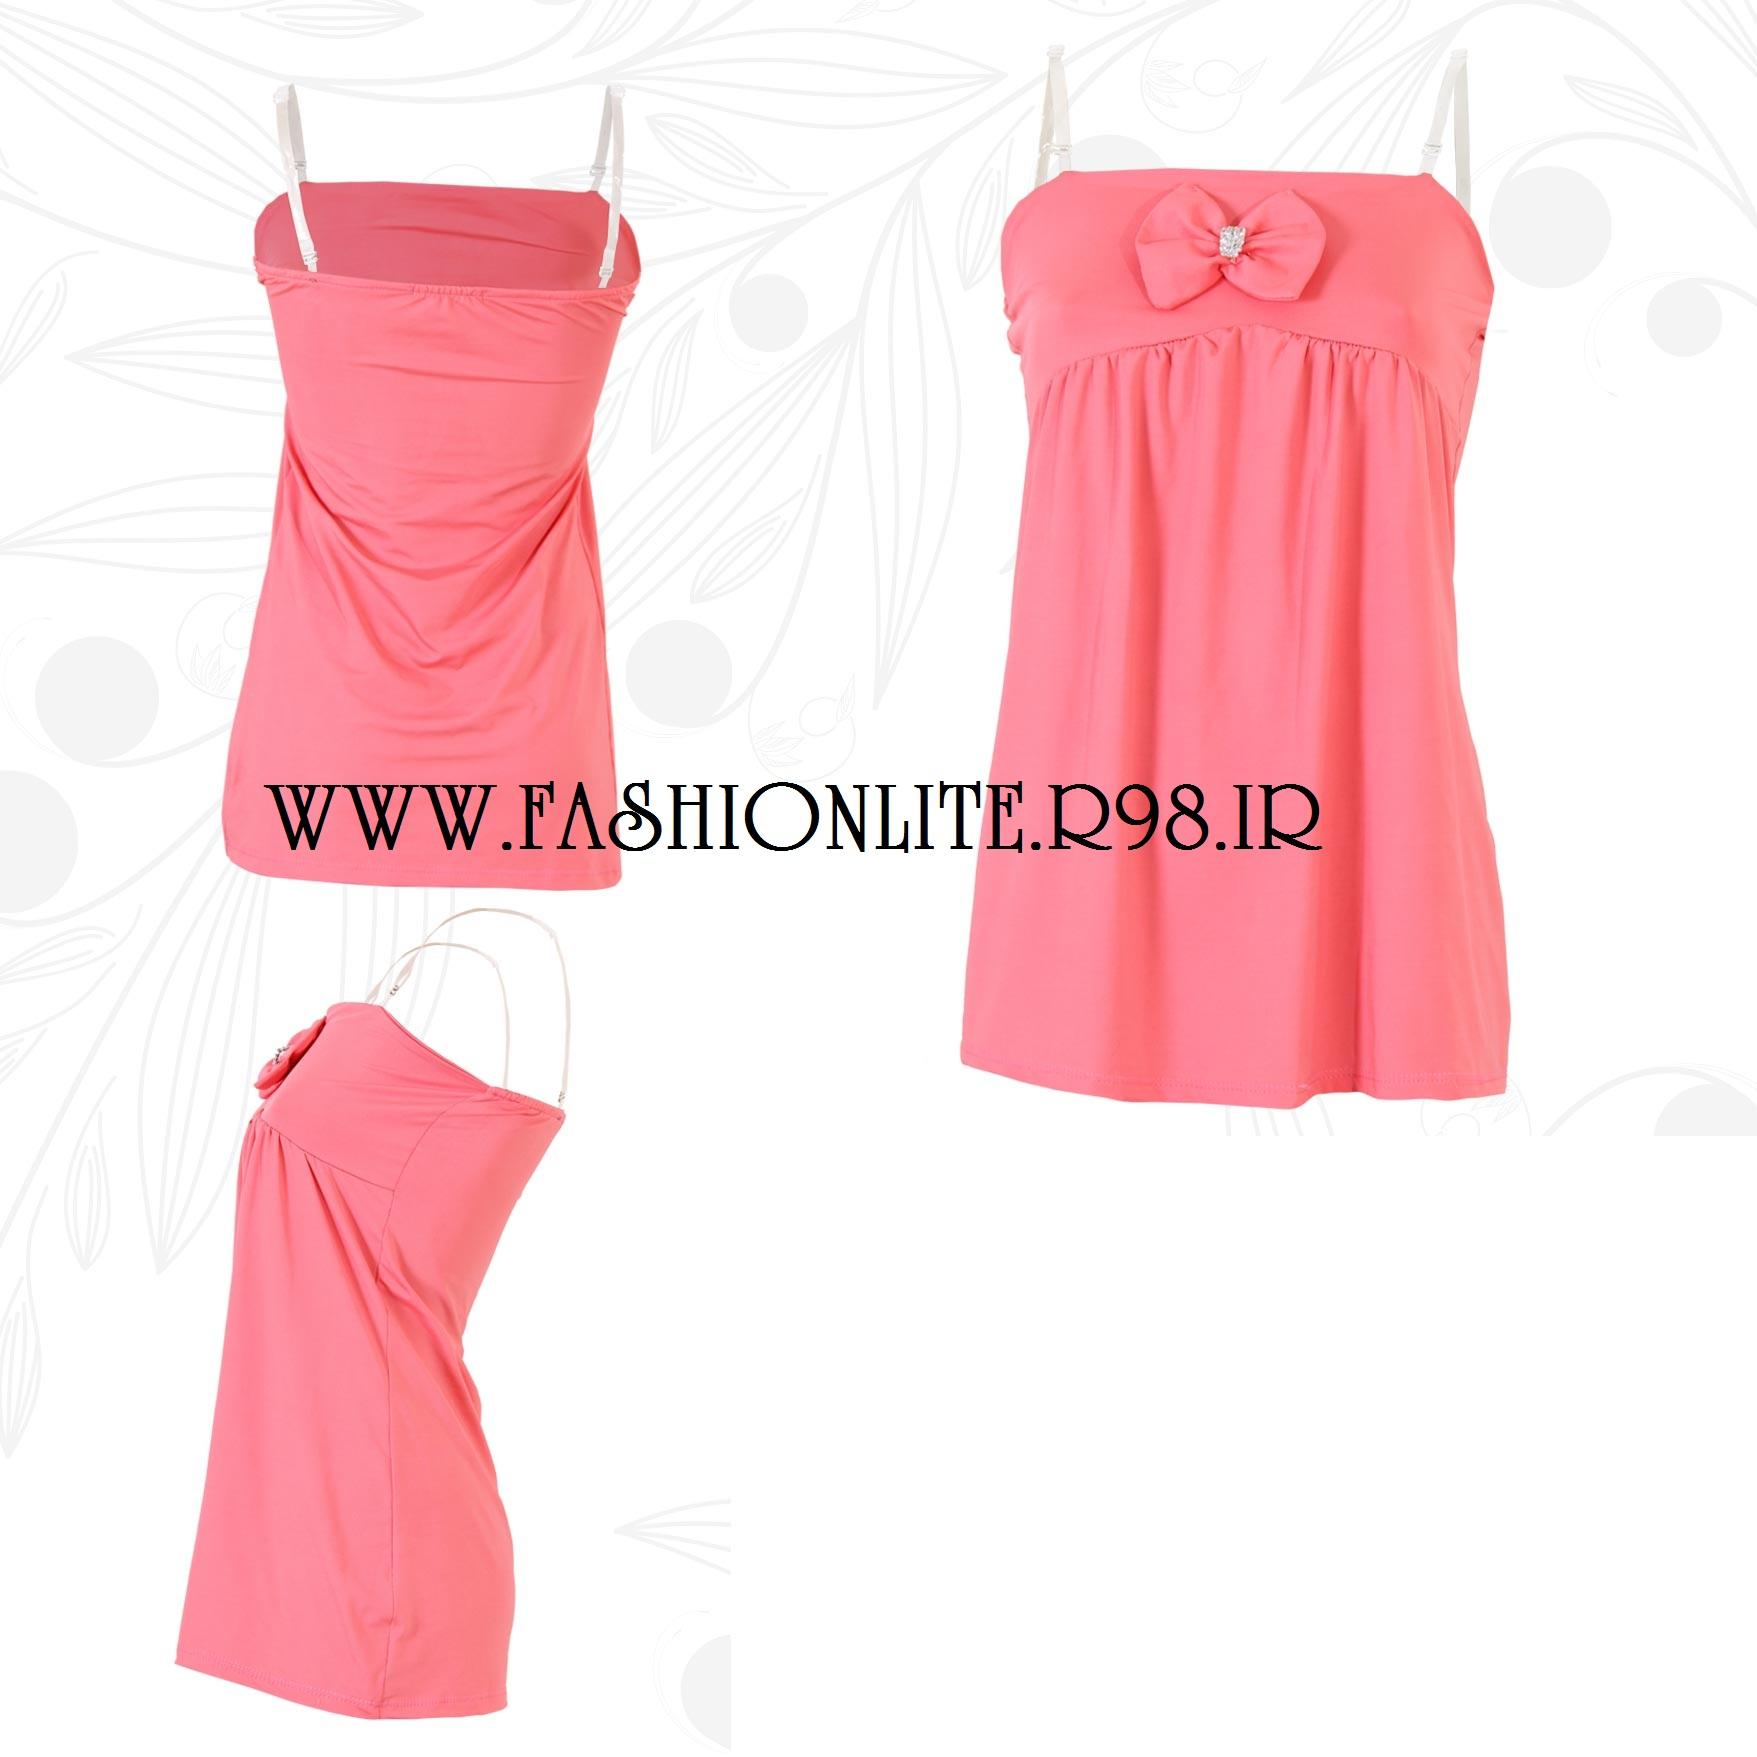 http://rozup.ir/up/fashionlite/mode/R/24_sunglasses.jpg